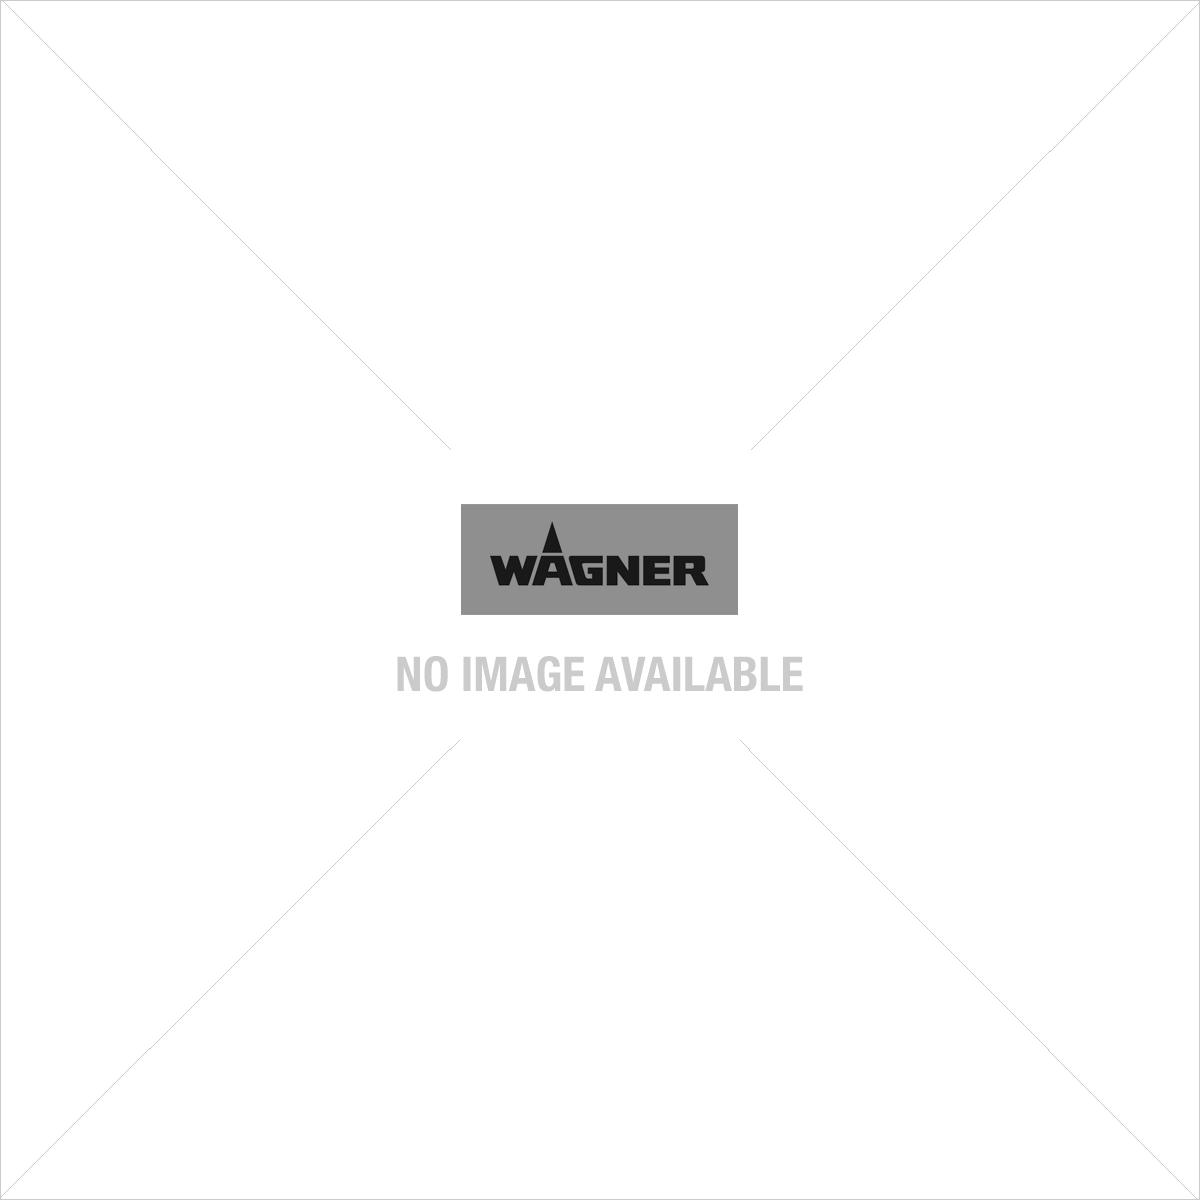 Wagner XVLP 3500 Paint Sprayer